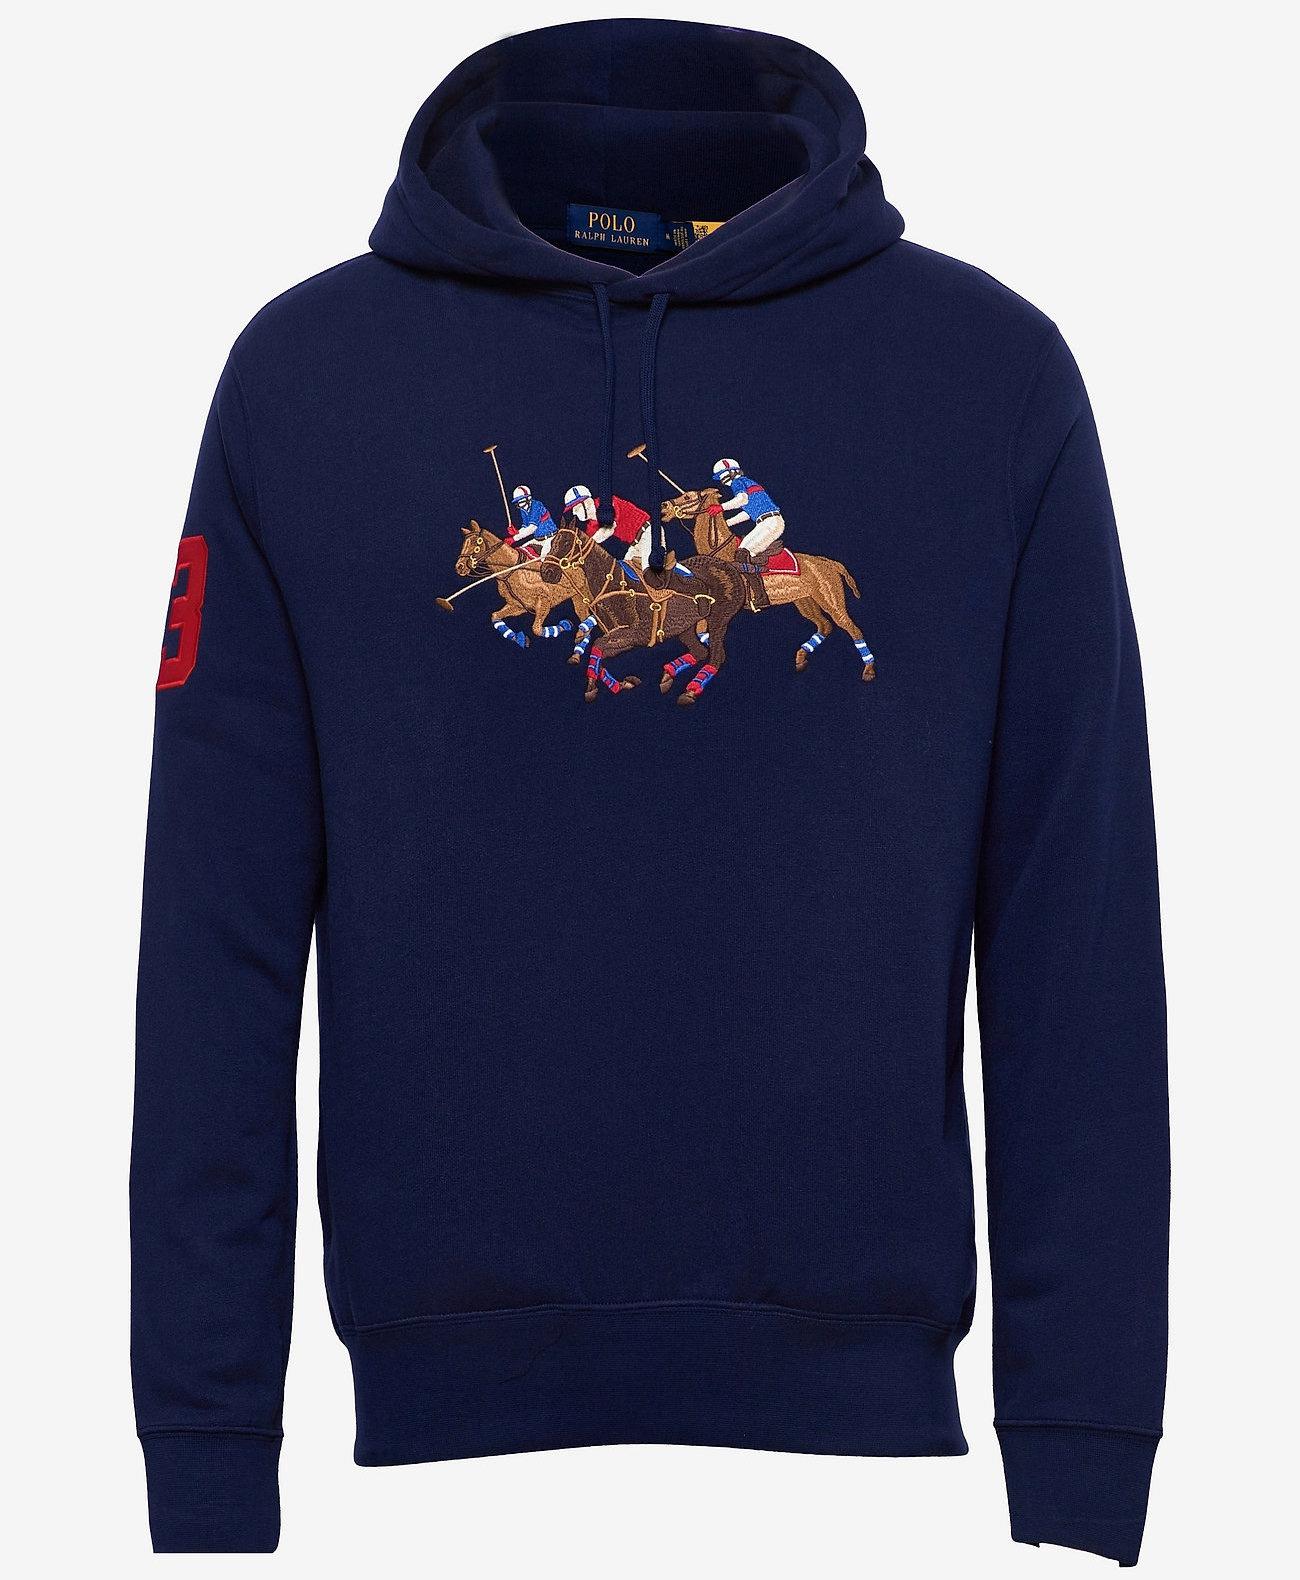 Polo Ralph Lauren Triple-Pony Crest Hoodie, blauw